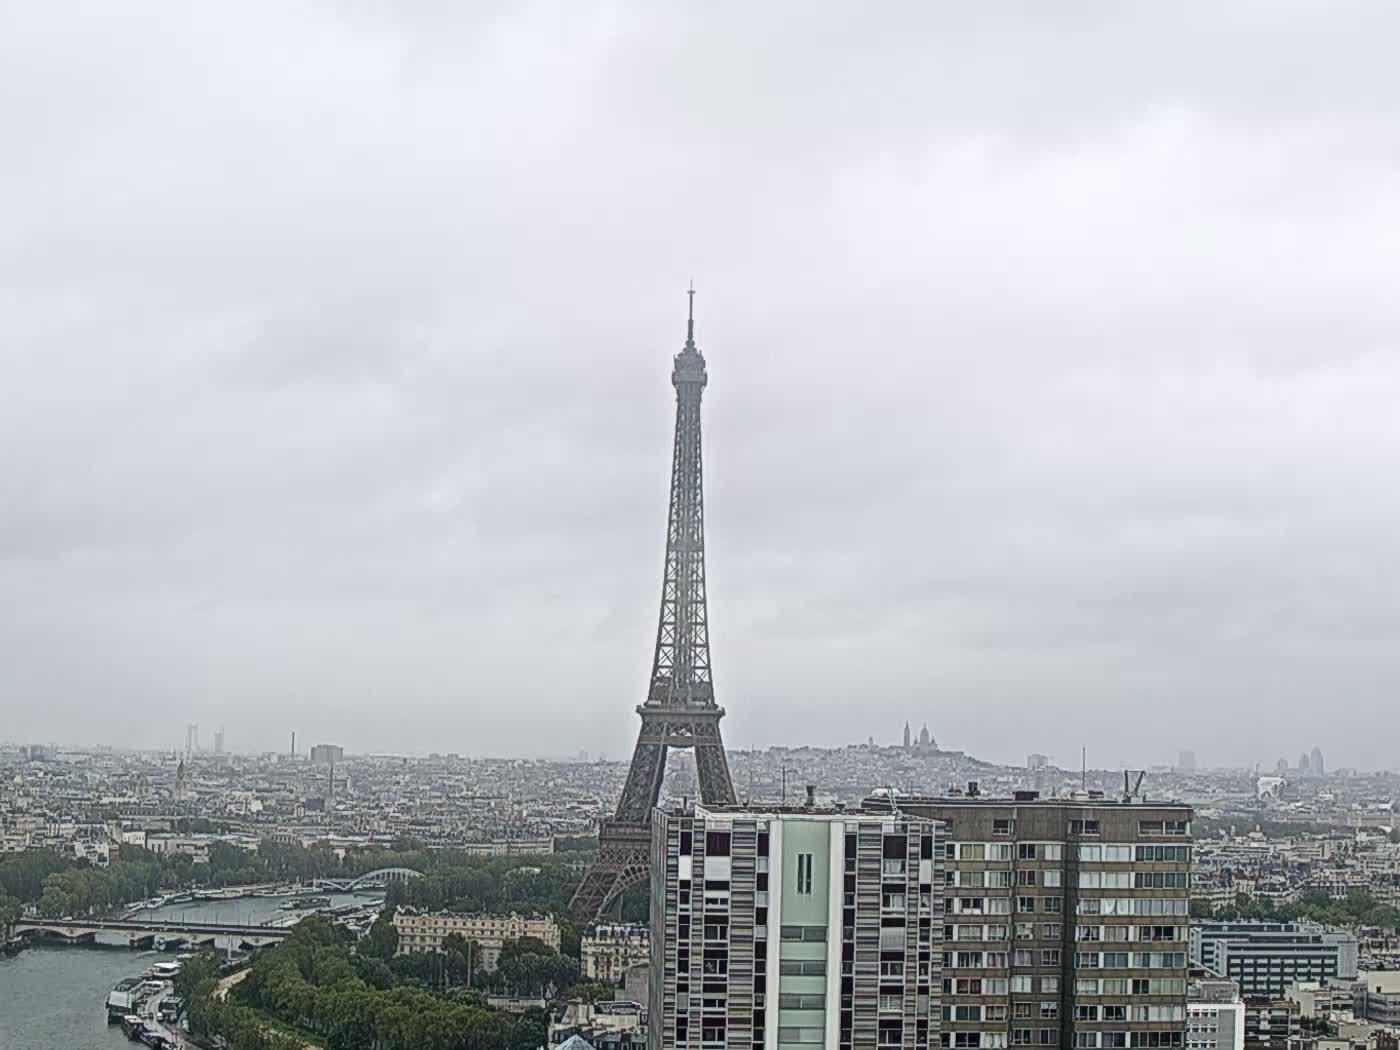 Paris Thu. 09:22